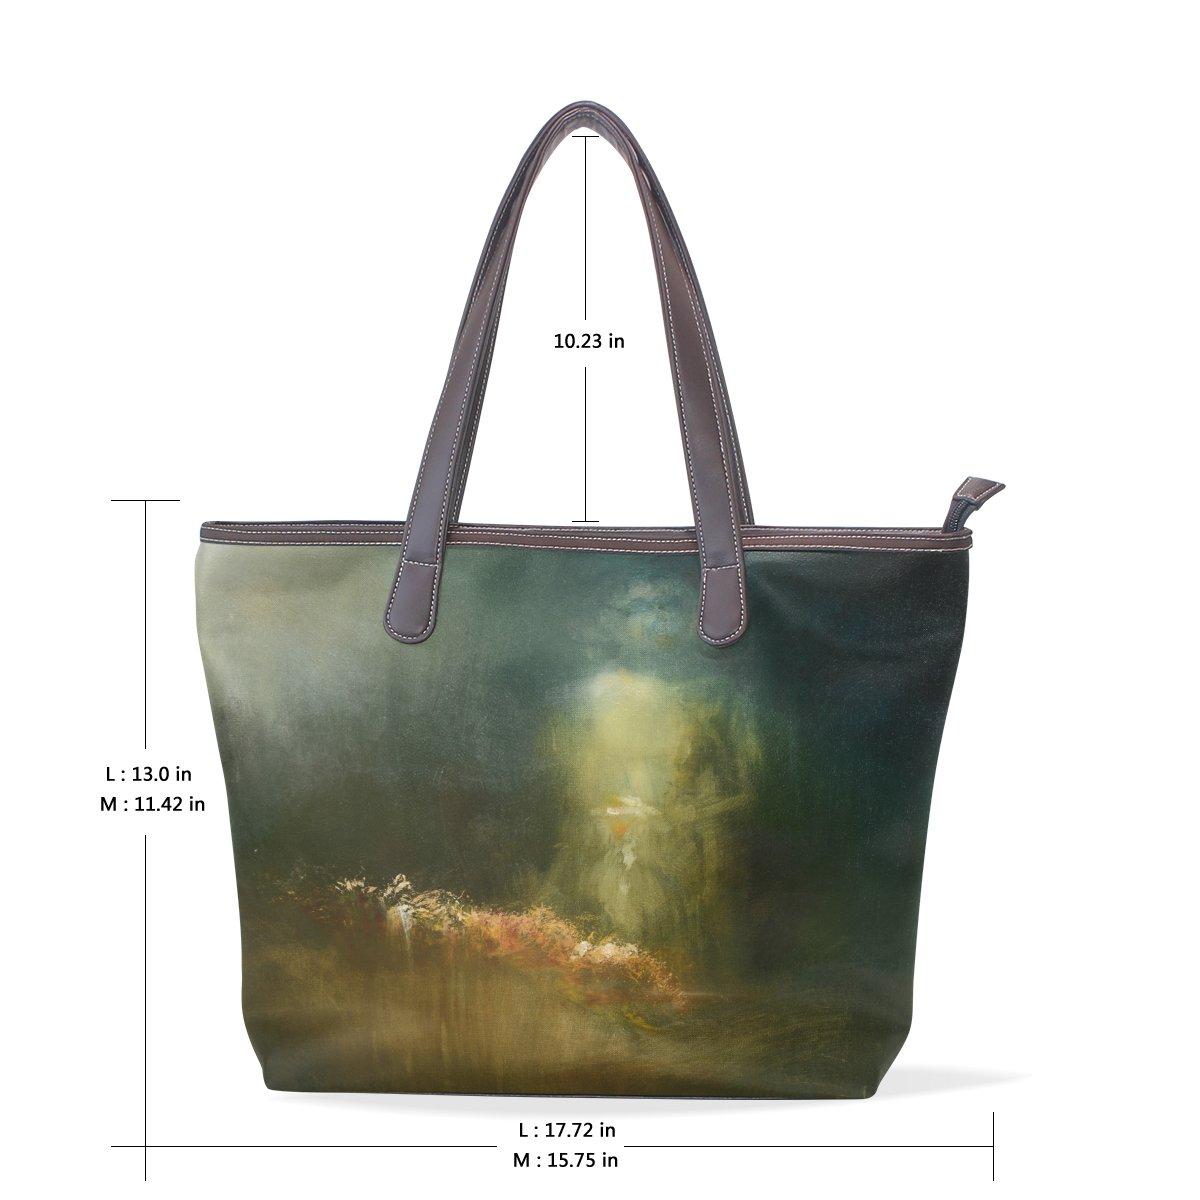 Ye Store Abstract Watercolor Lady PU Leather Handbag Tote Bag Shoulder Bag Shopping Bag